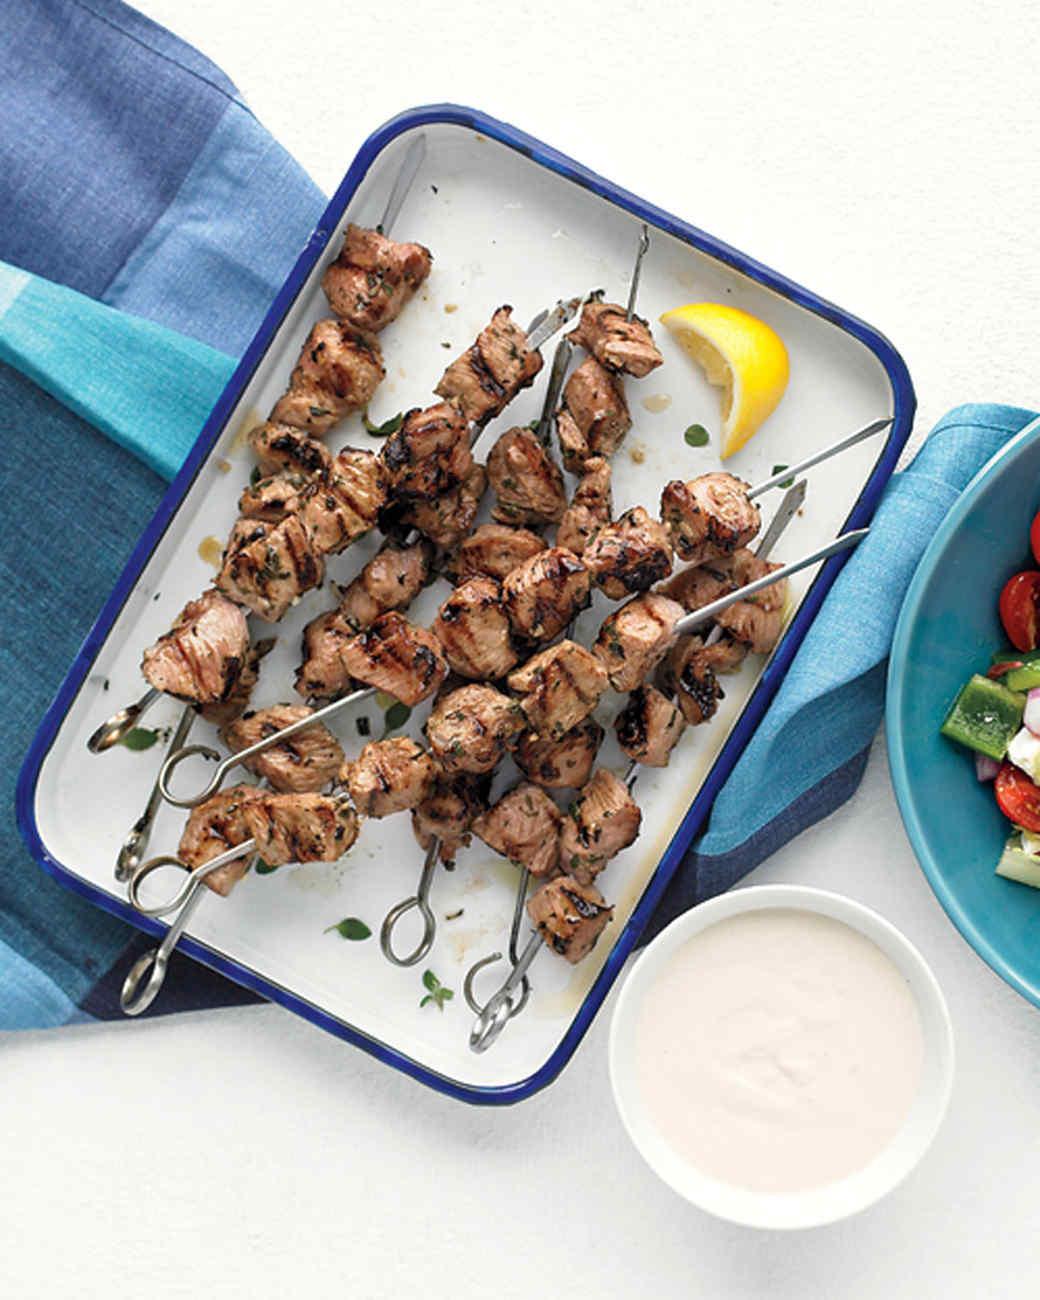 Shish kebab in aerogrill. Simple and delicious recipes 8